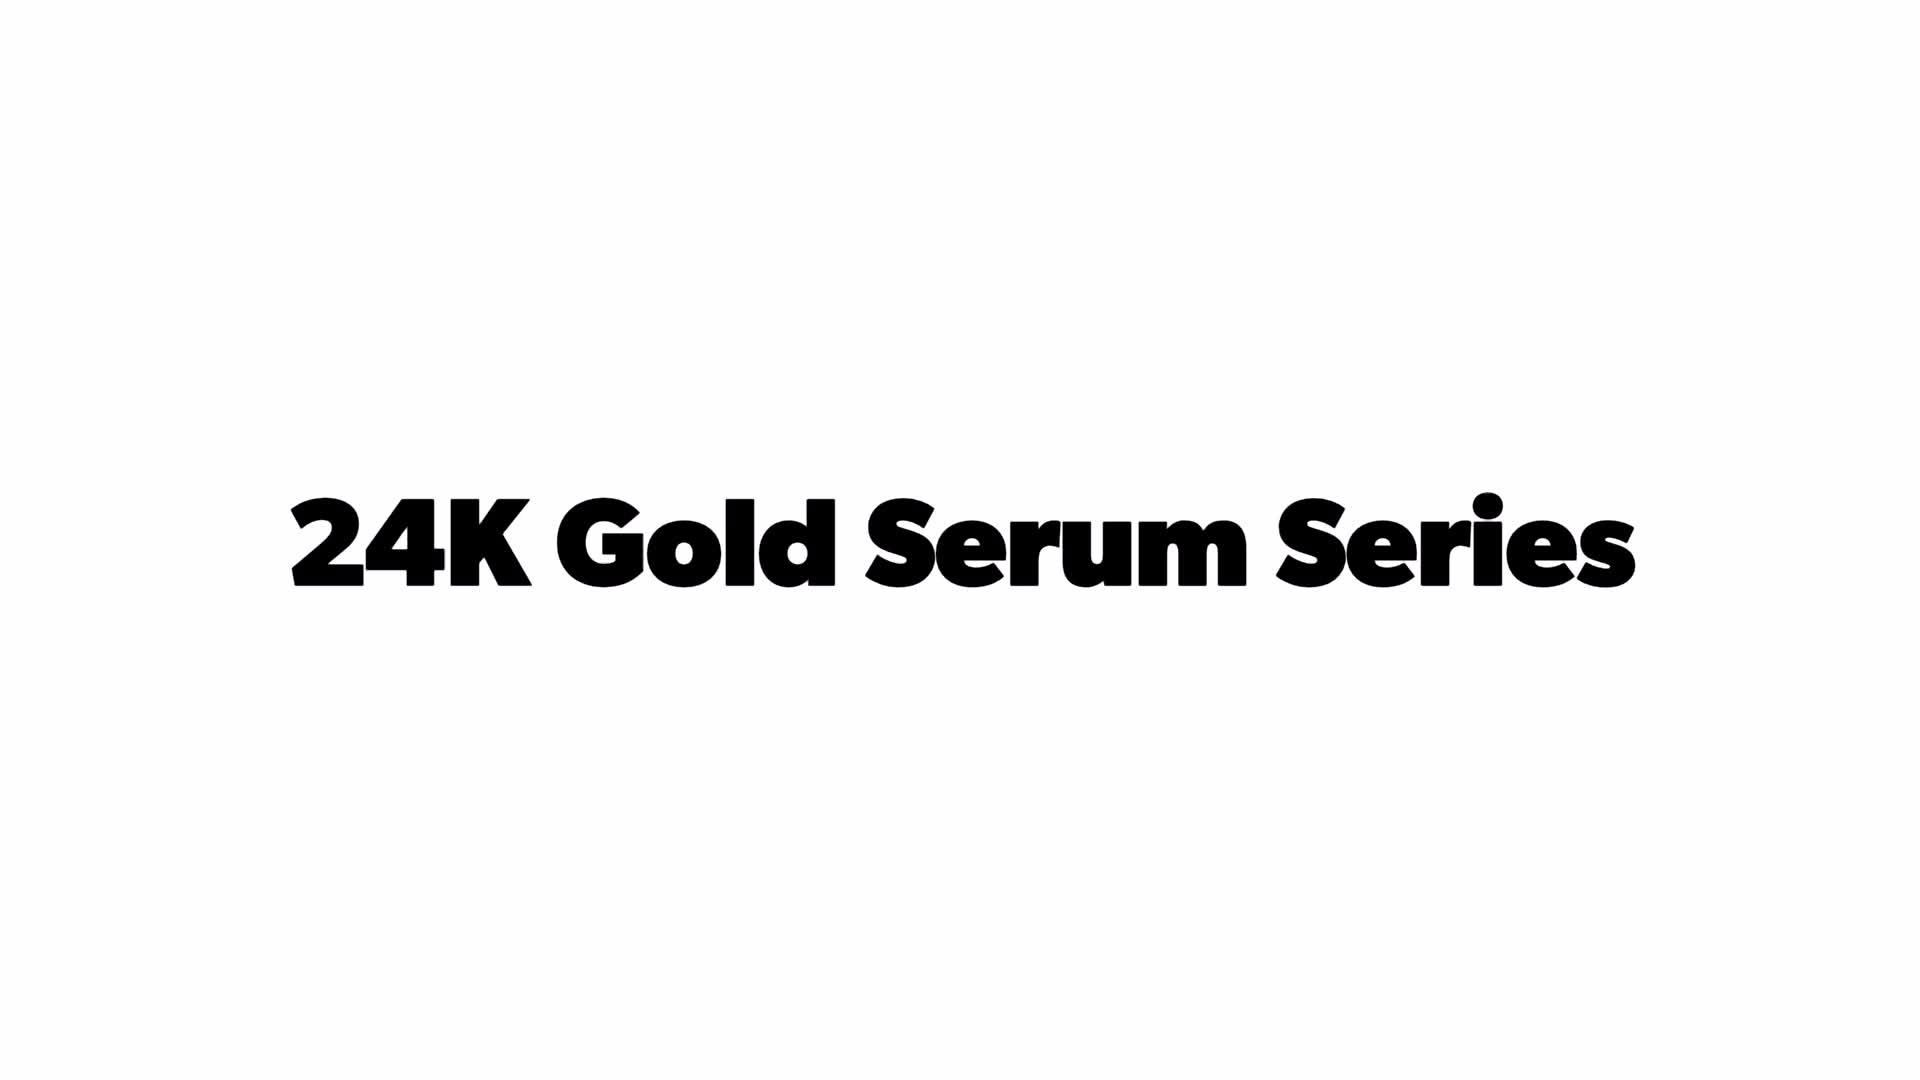 24k Gold Serum Private Label Hyaluronic Acid 24k Gold Face Serum 24k Gold Serum